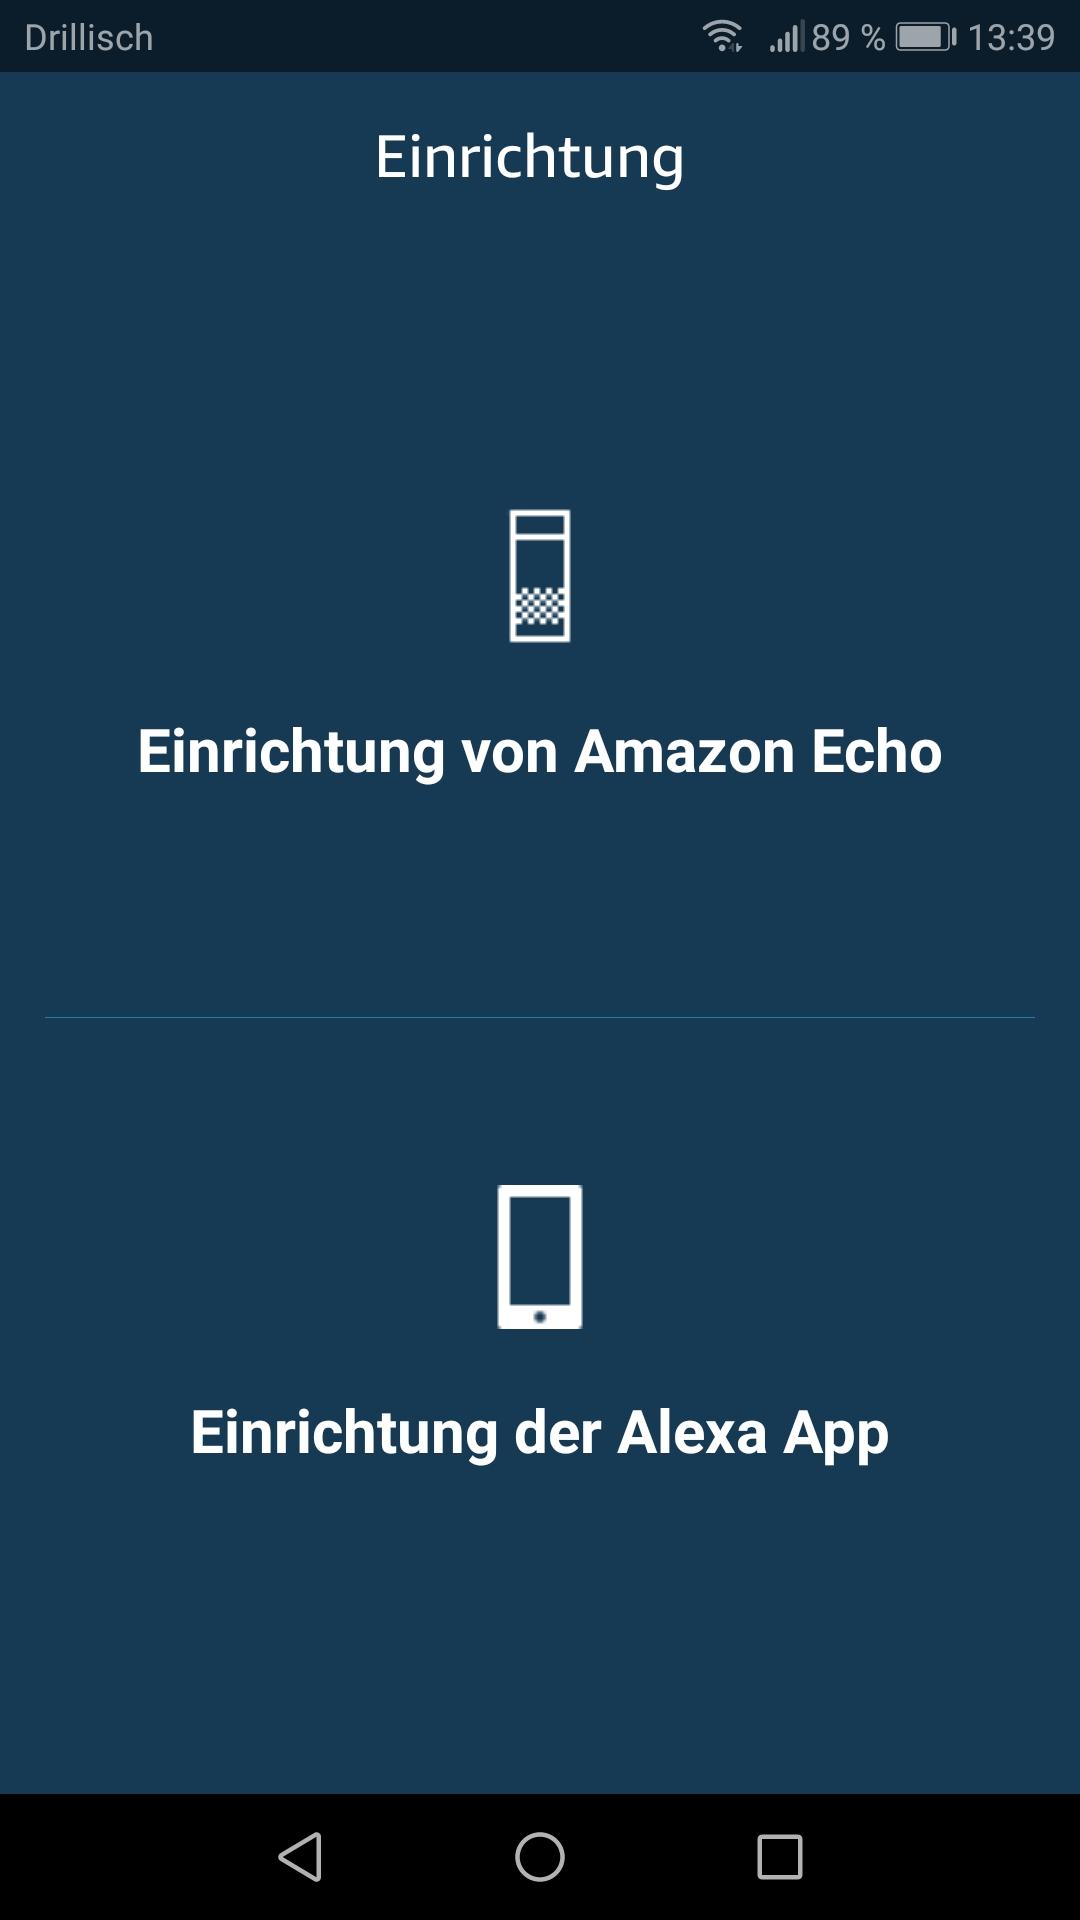 Smartphone App: Auswahl der Gerätekategorie